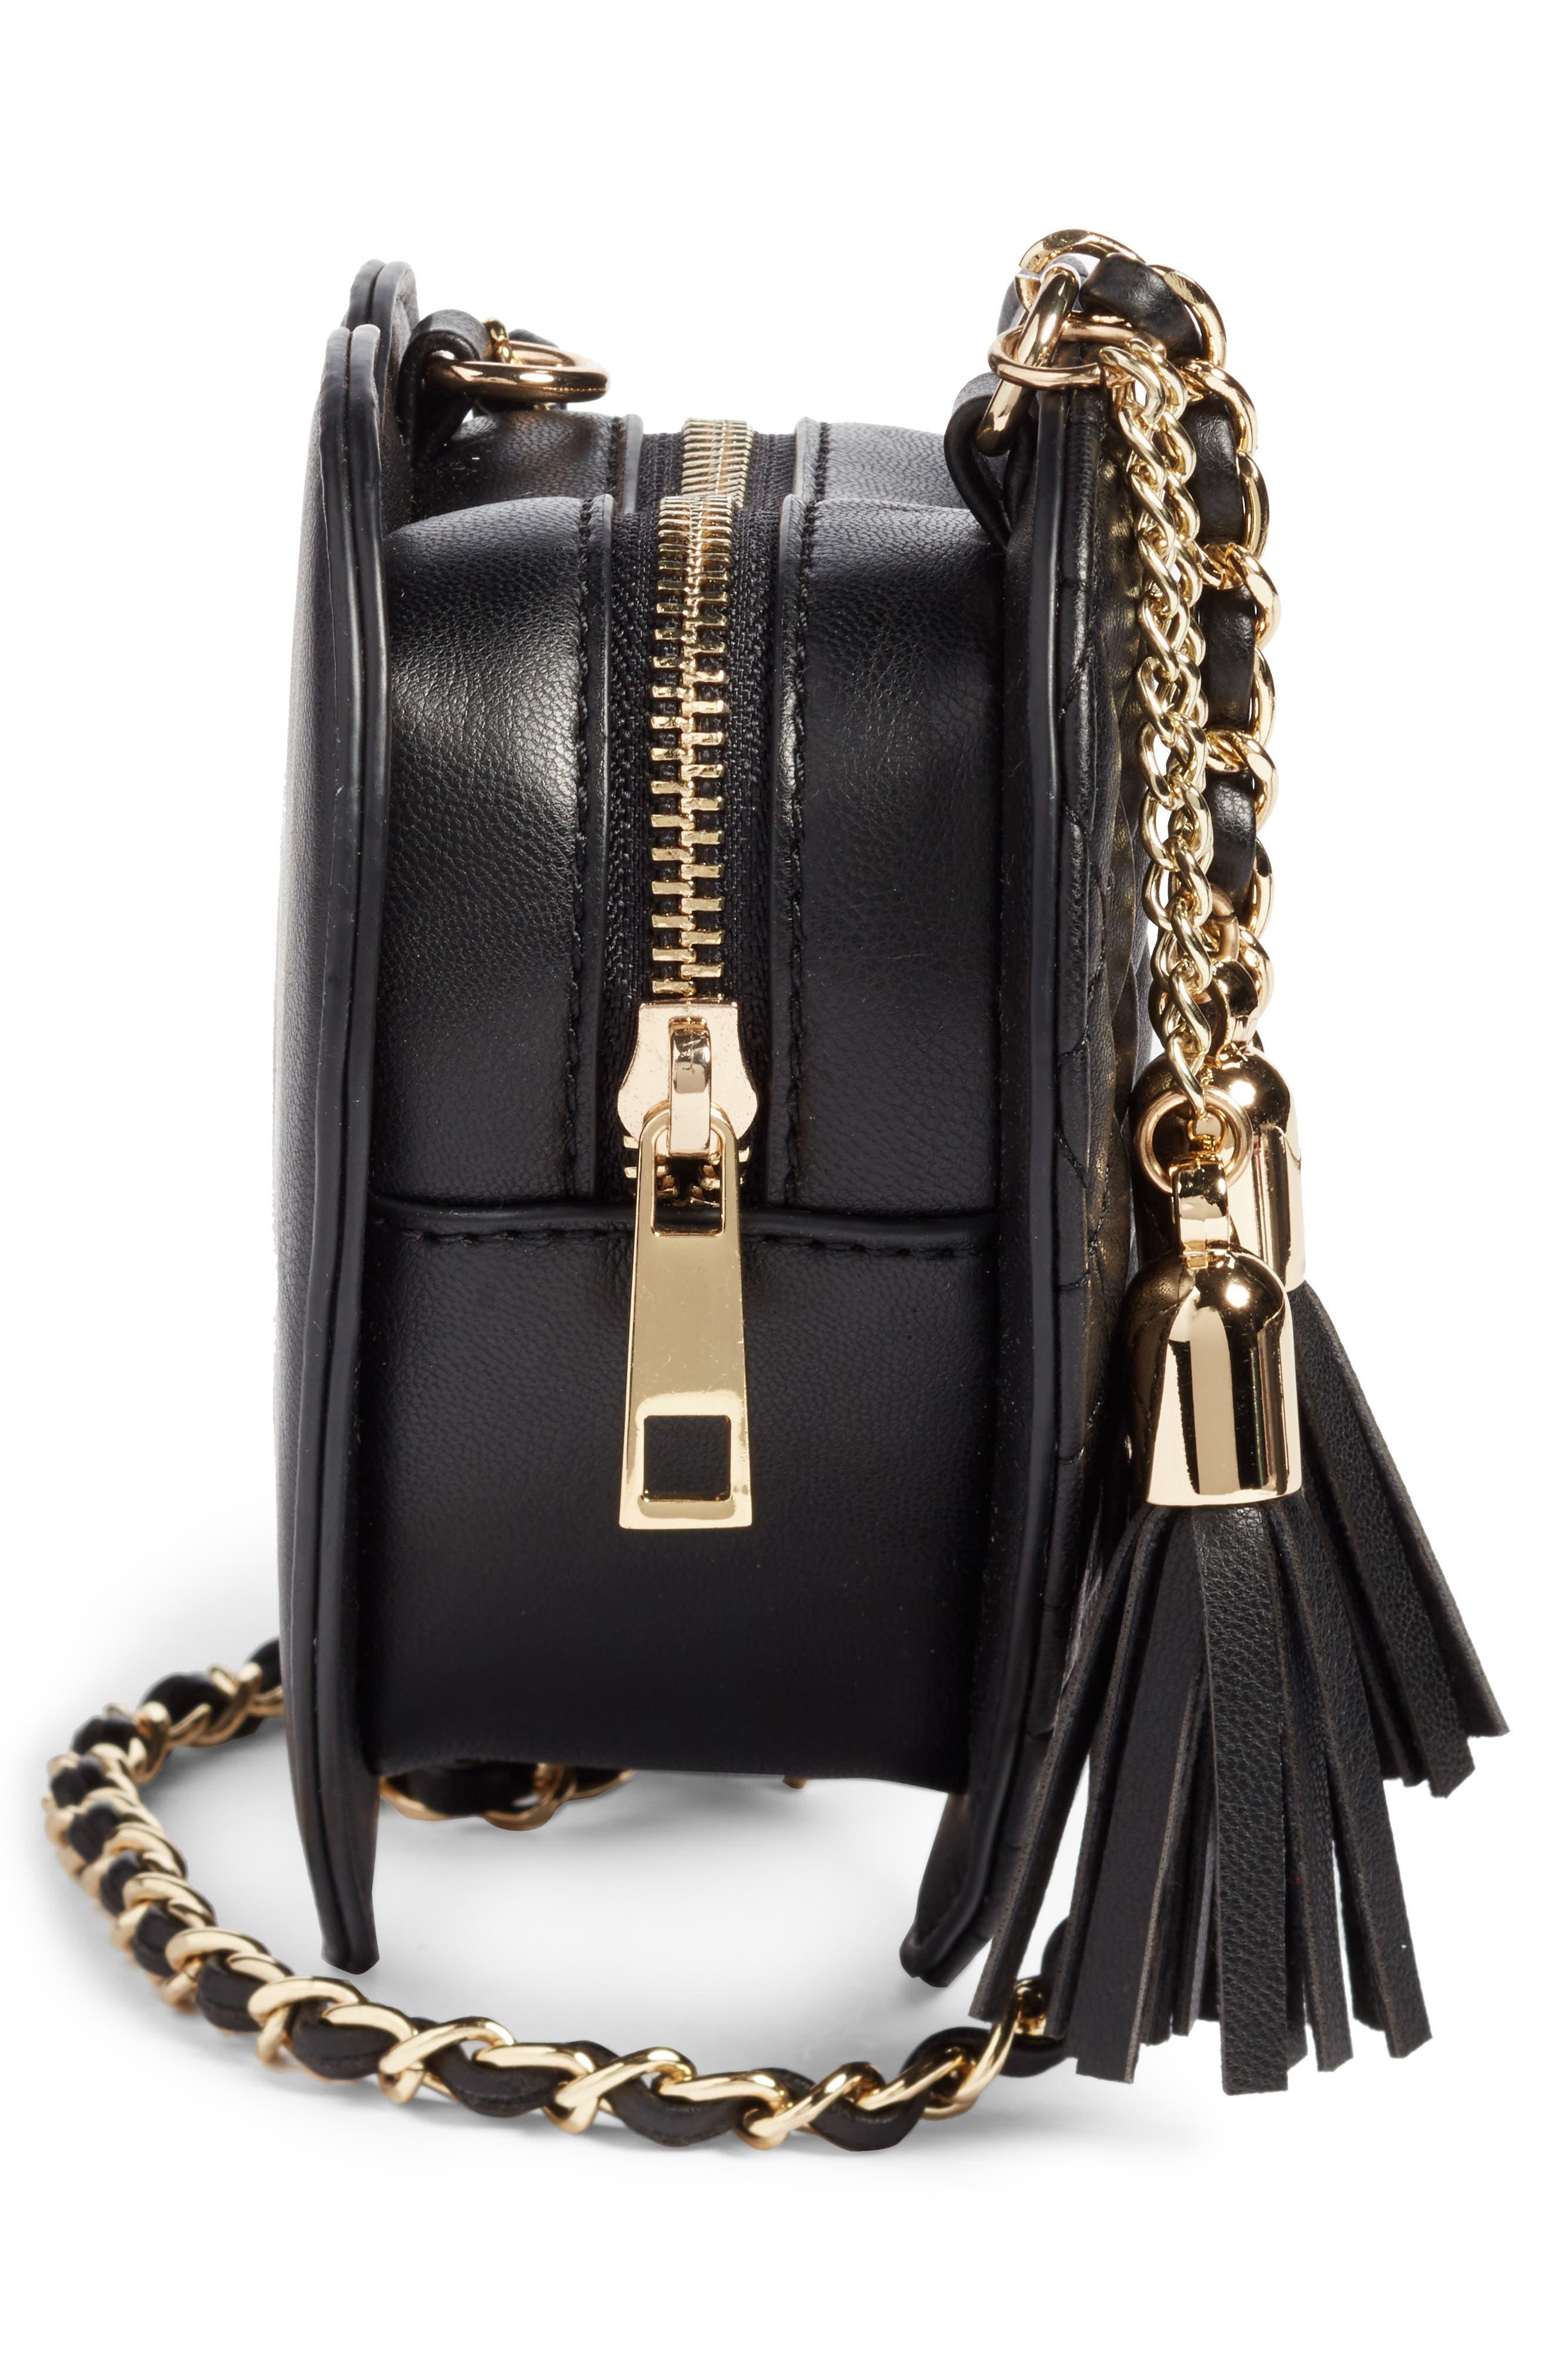 Mali + Lili Quilted Heart Vegan Leather Crossbody Bag,                             Alternate thumbnail 5, color,                             Black